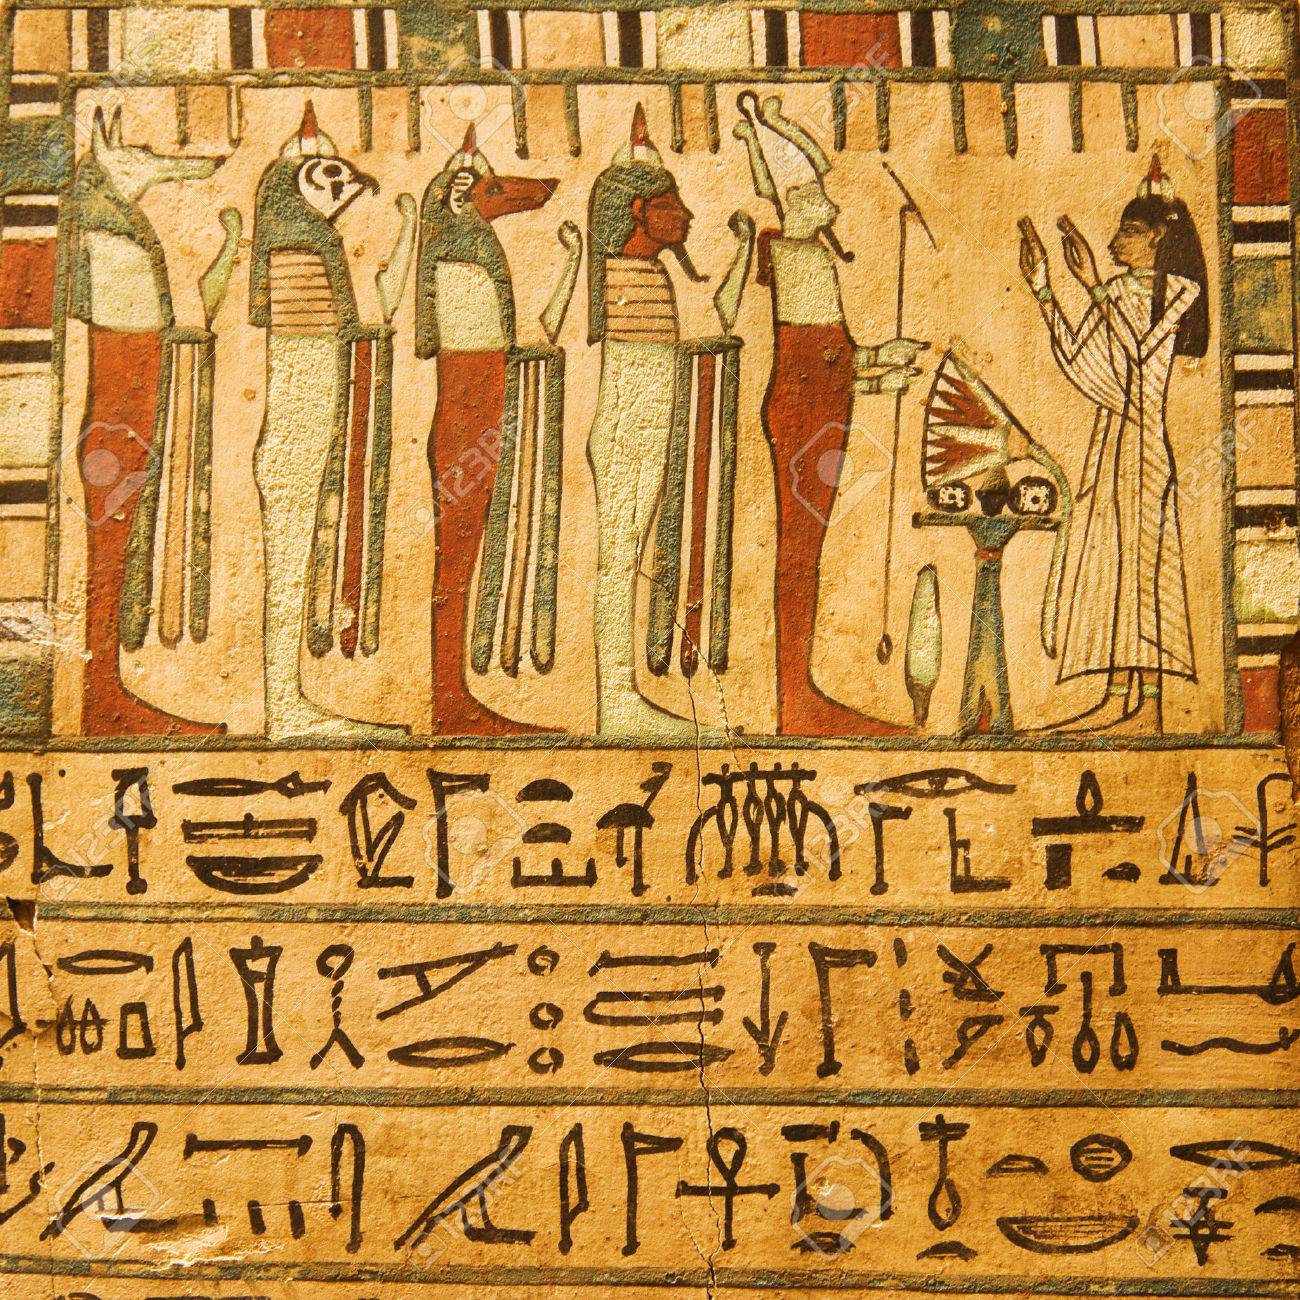 Ancient egyptian gods and hieroglyphics painted on stone stock ancient egyptian gods and hieroglyphics painted on stone stock photo 38299194 biocorpaavc